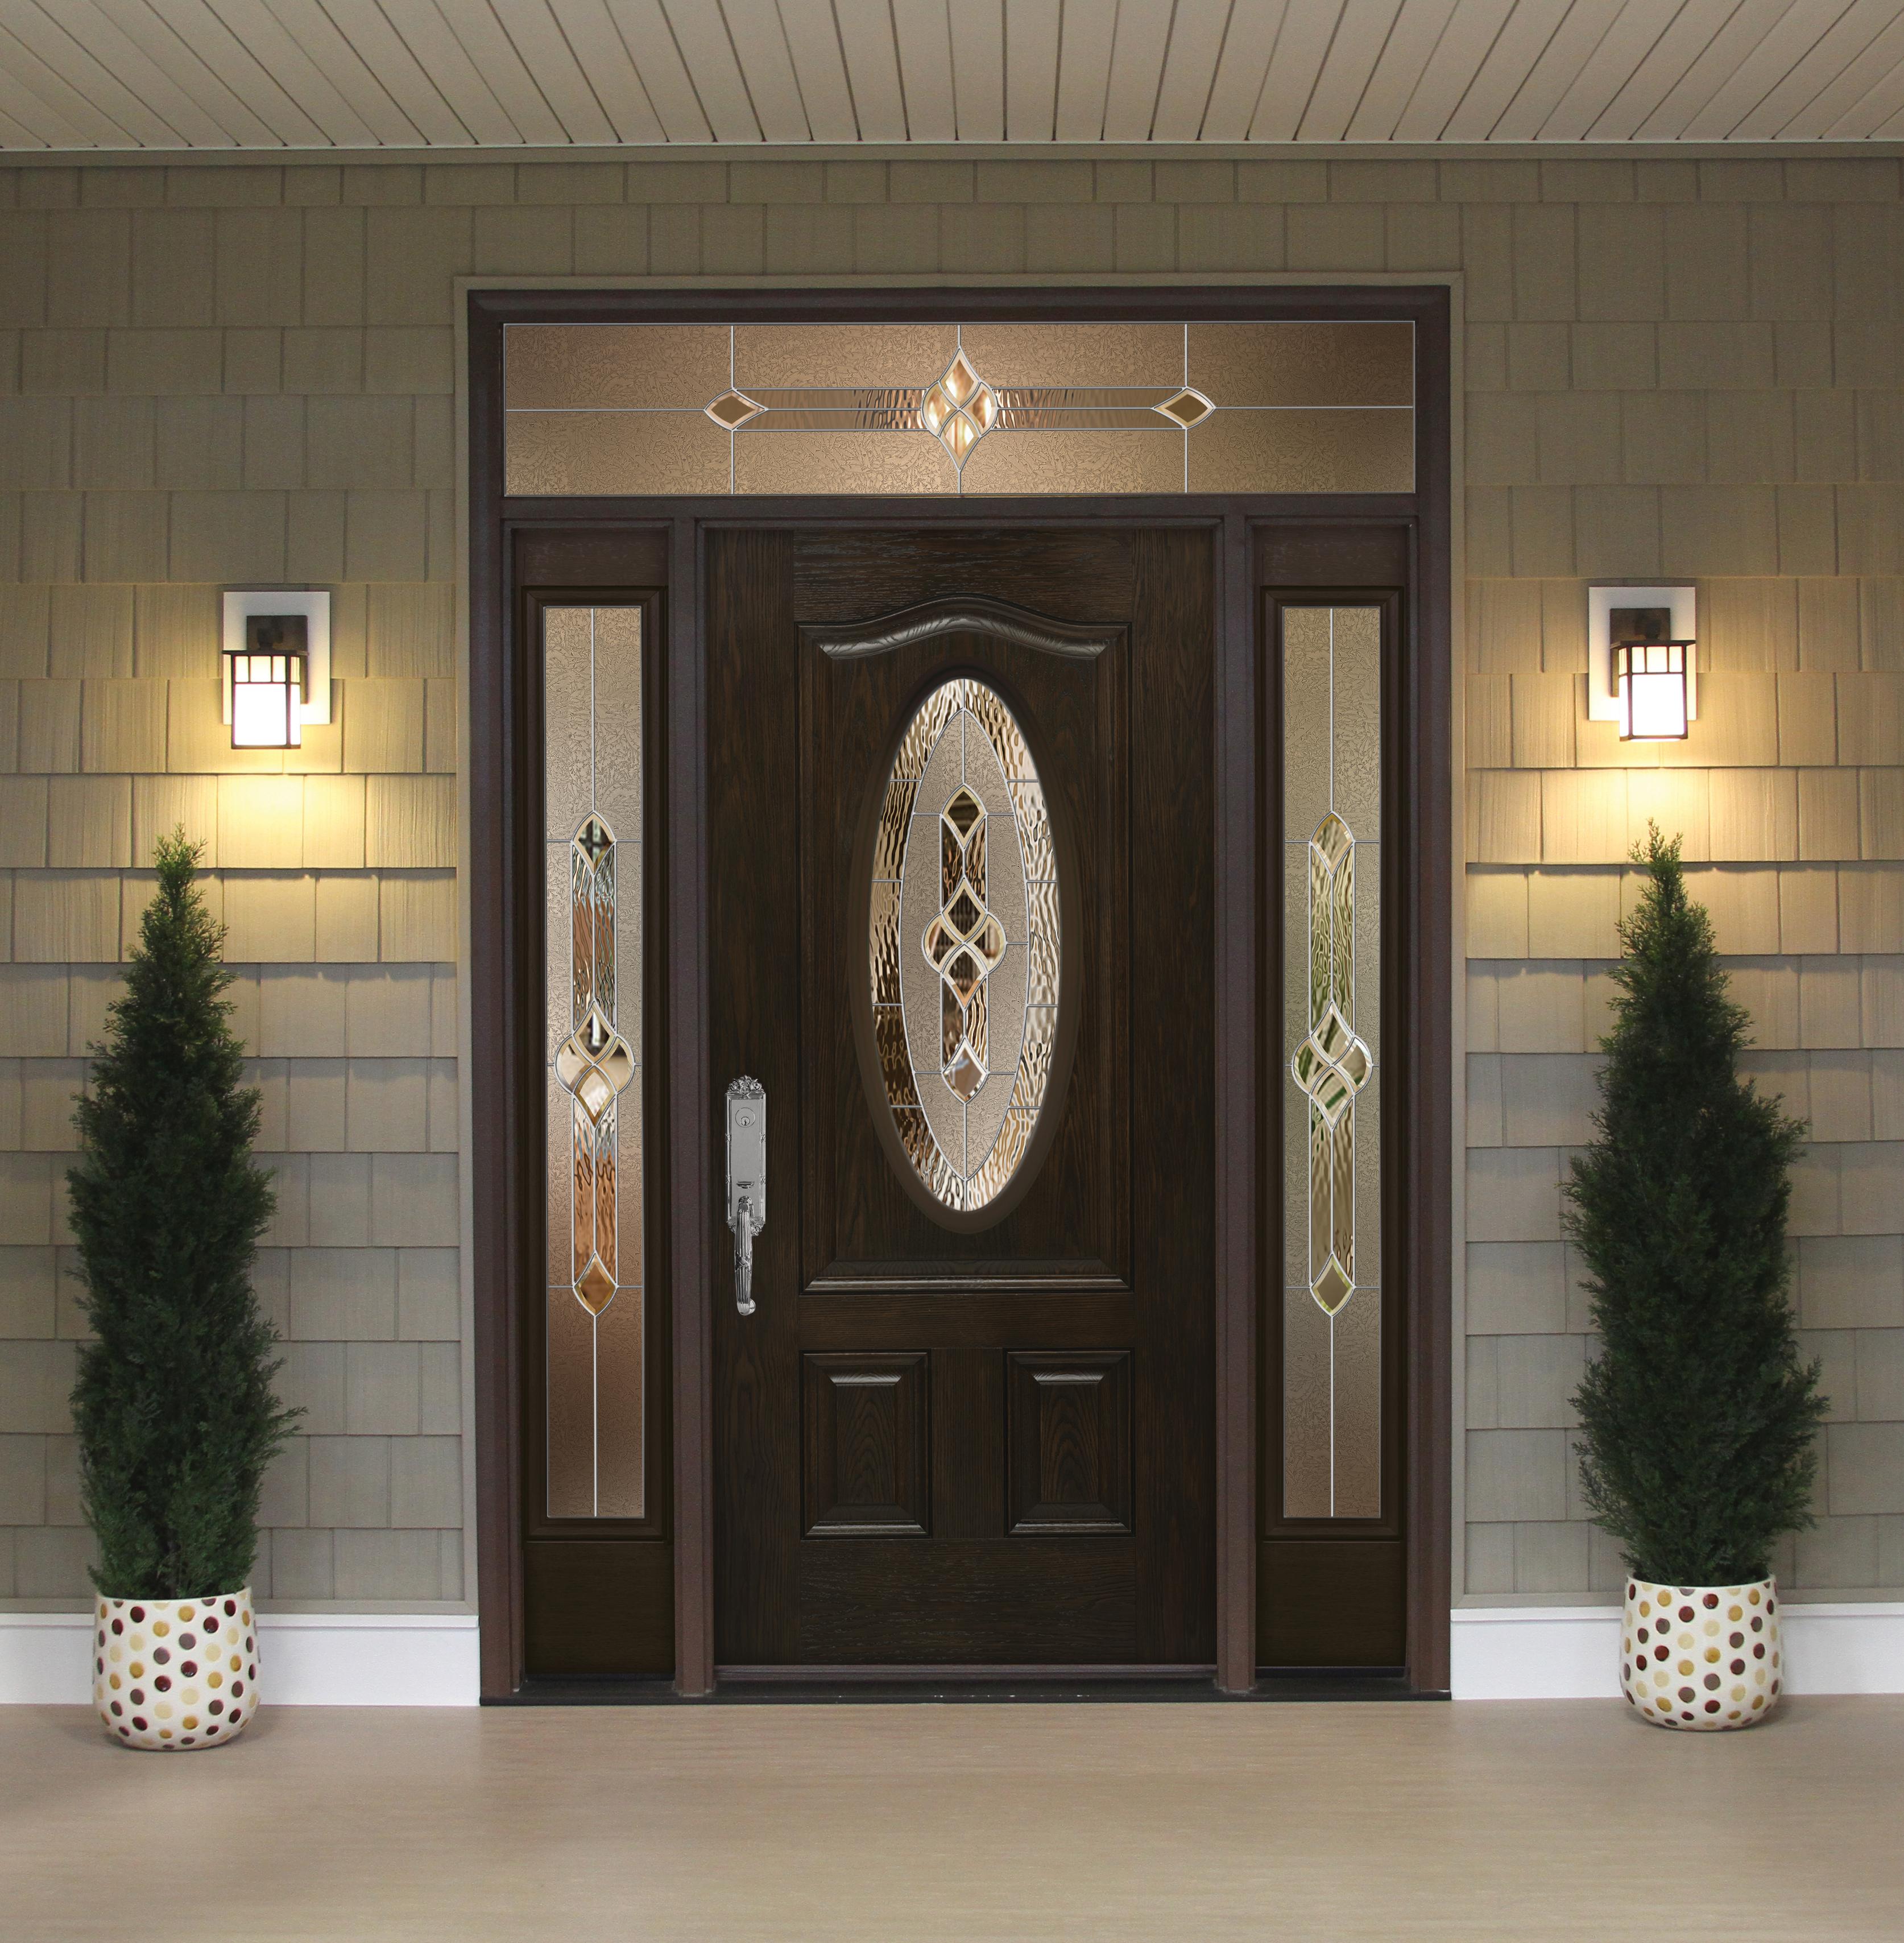 ProVia Signet Fiberglass Front Door from Brennan Enterprises in Dallas TX. & Hinged Doors Vs. Pivot Doors Review